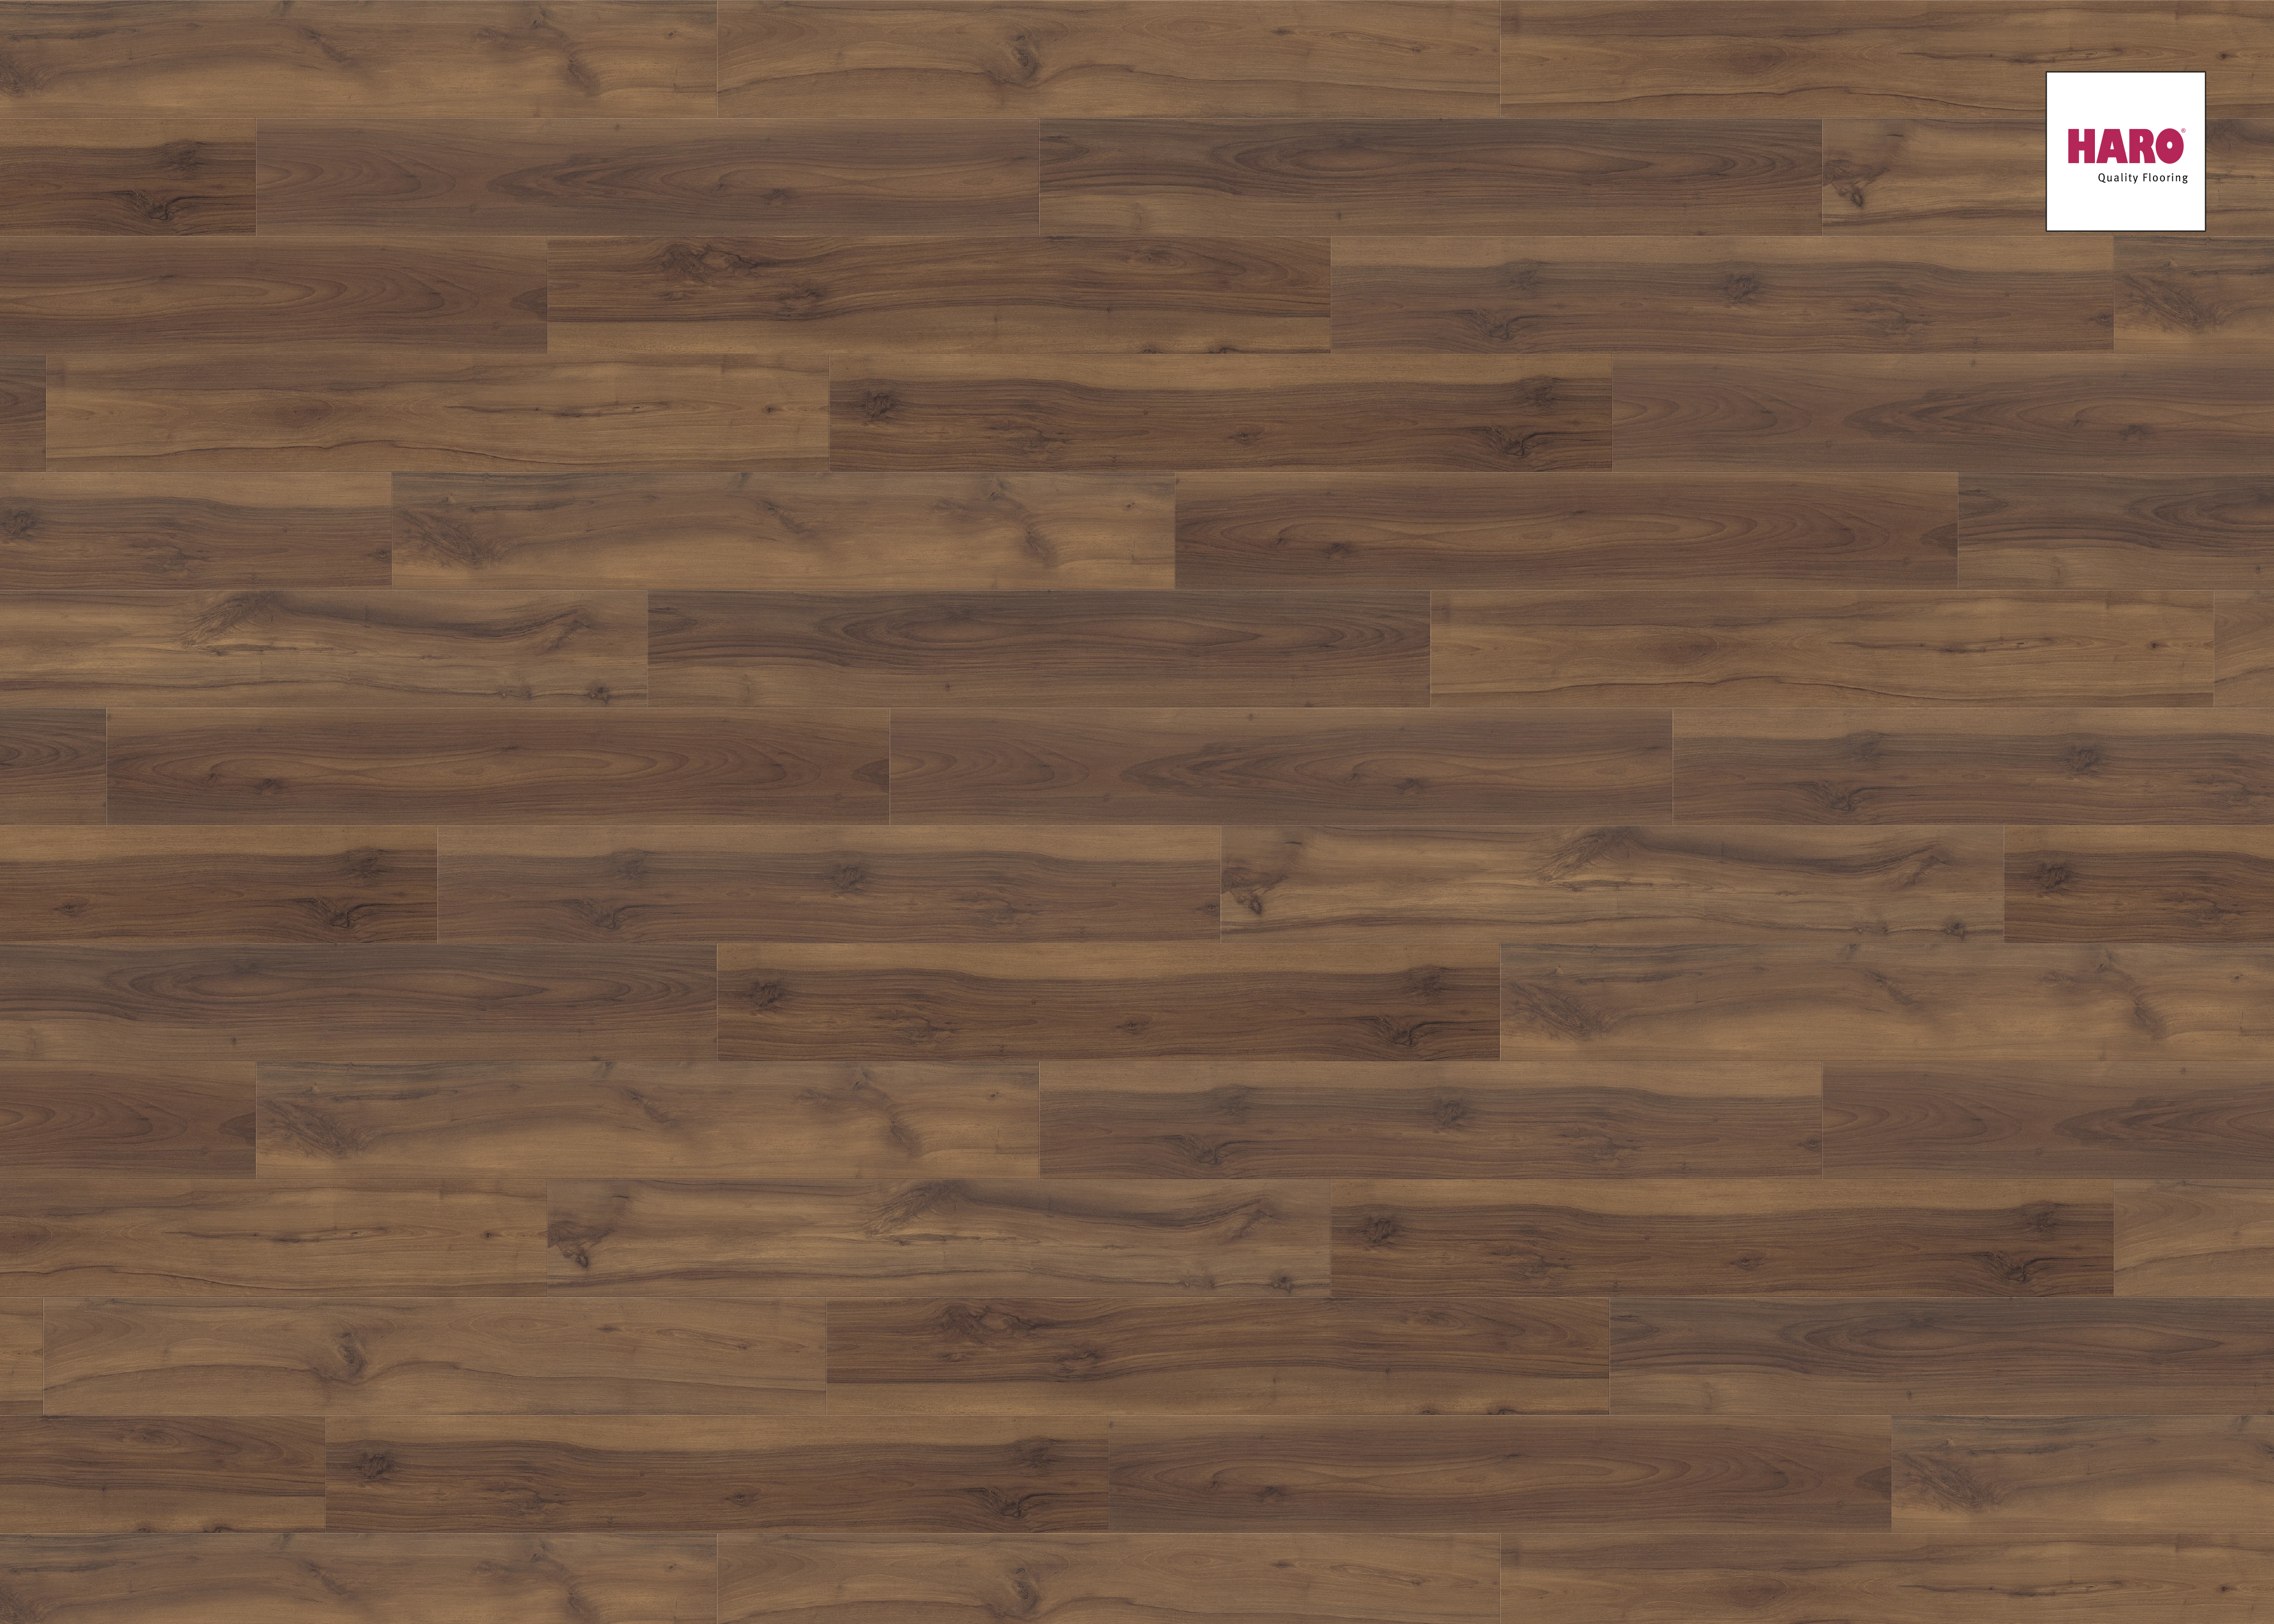 535241 haro laminat tritty 90 landhausdiele 4v nussbaum. Black Bedroom Furniture Sets. Home Design Ideas